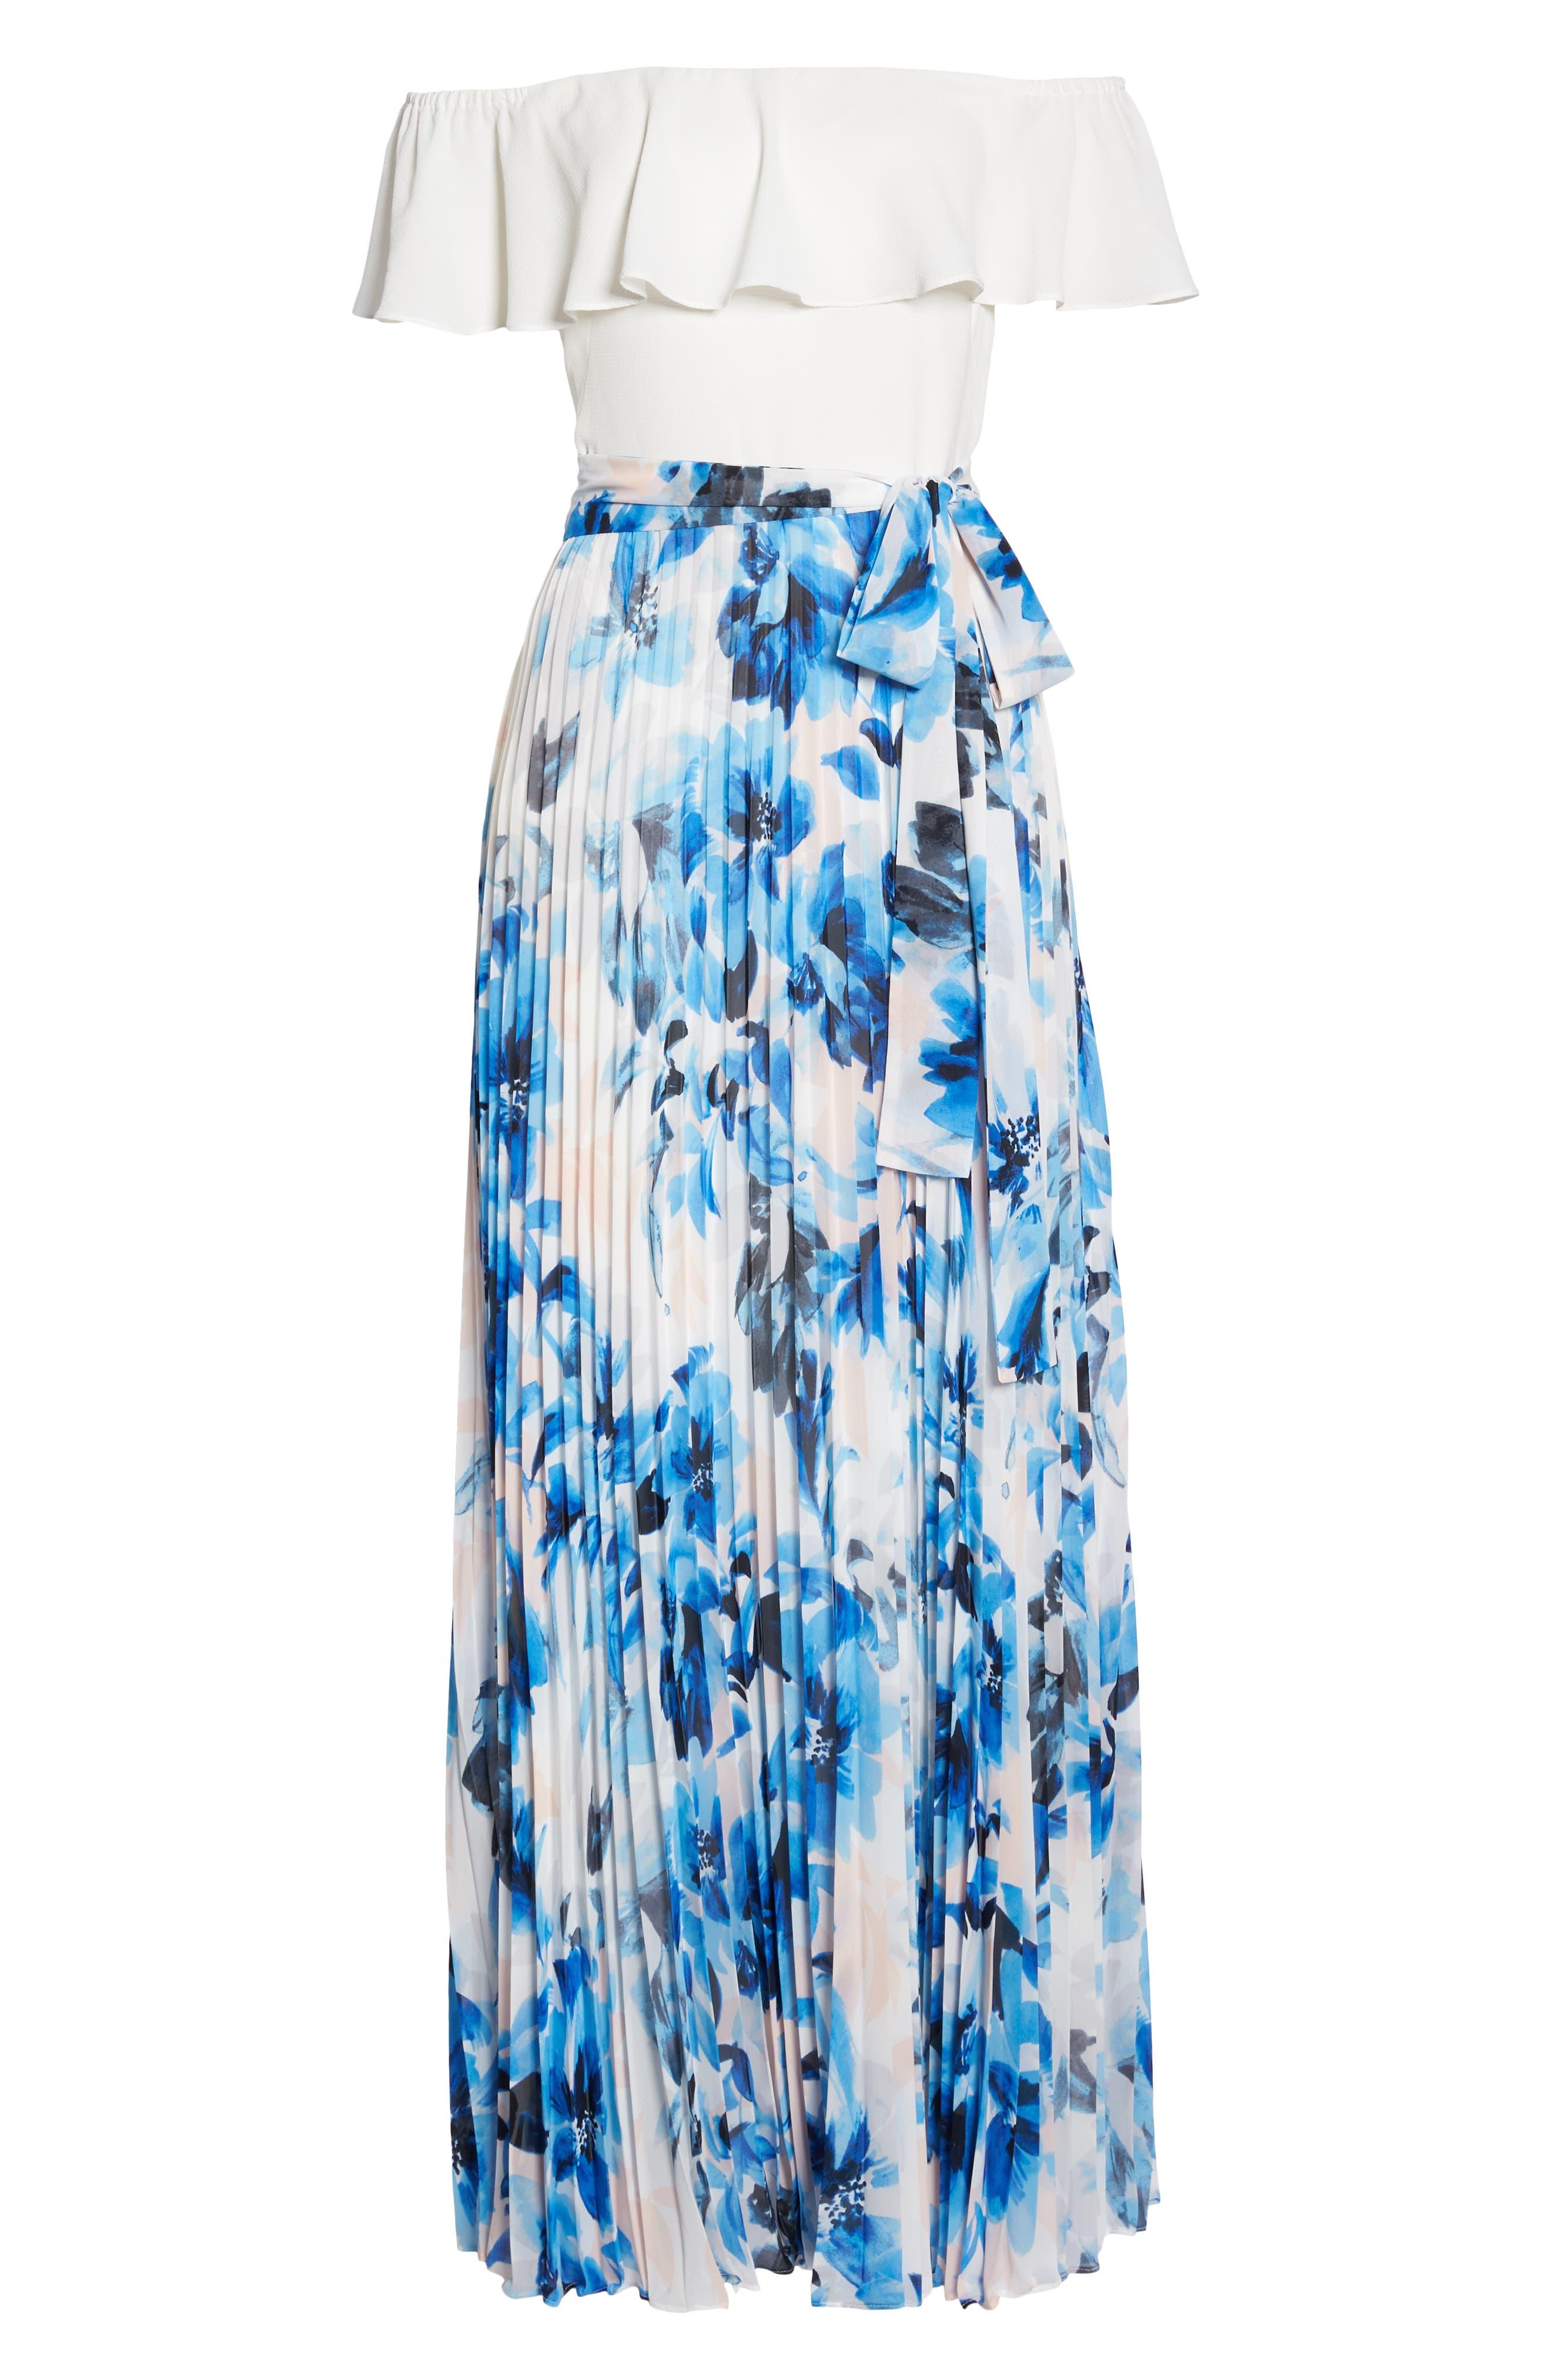 Ruffle Off the Shoulder Maxi Dress,                             Alternate thumbnail 7, color,                             Blue